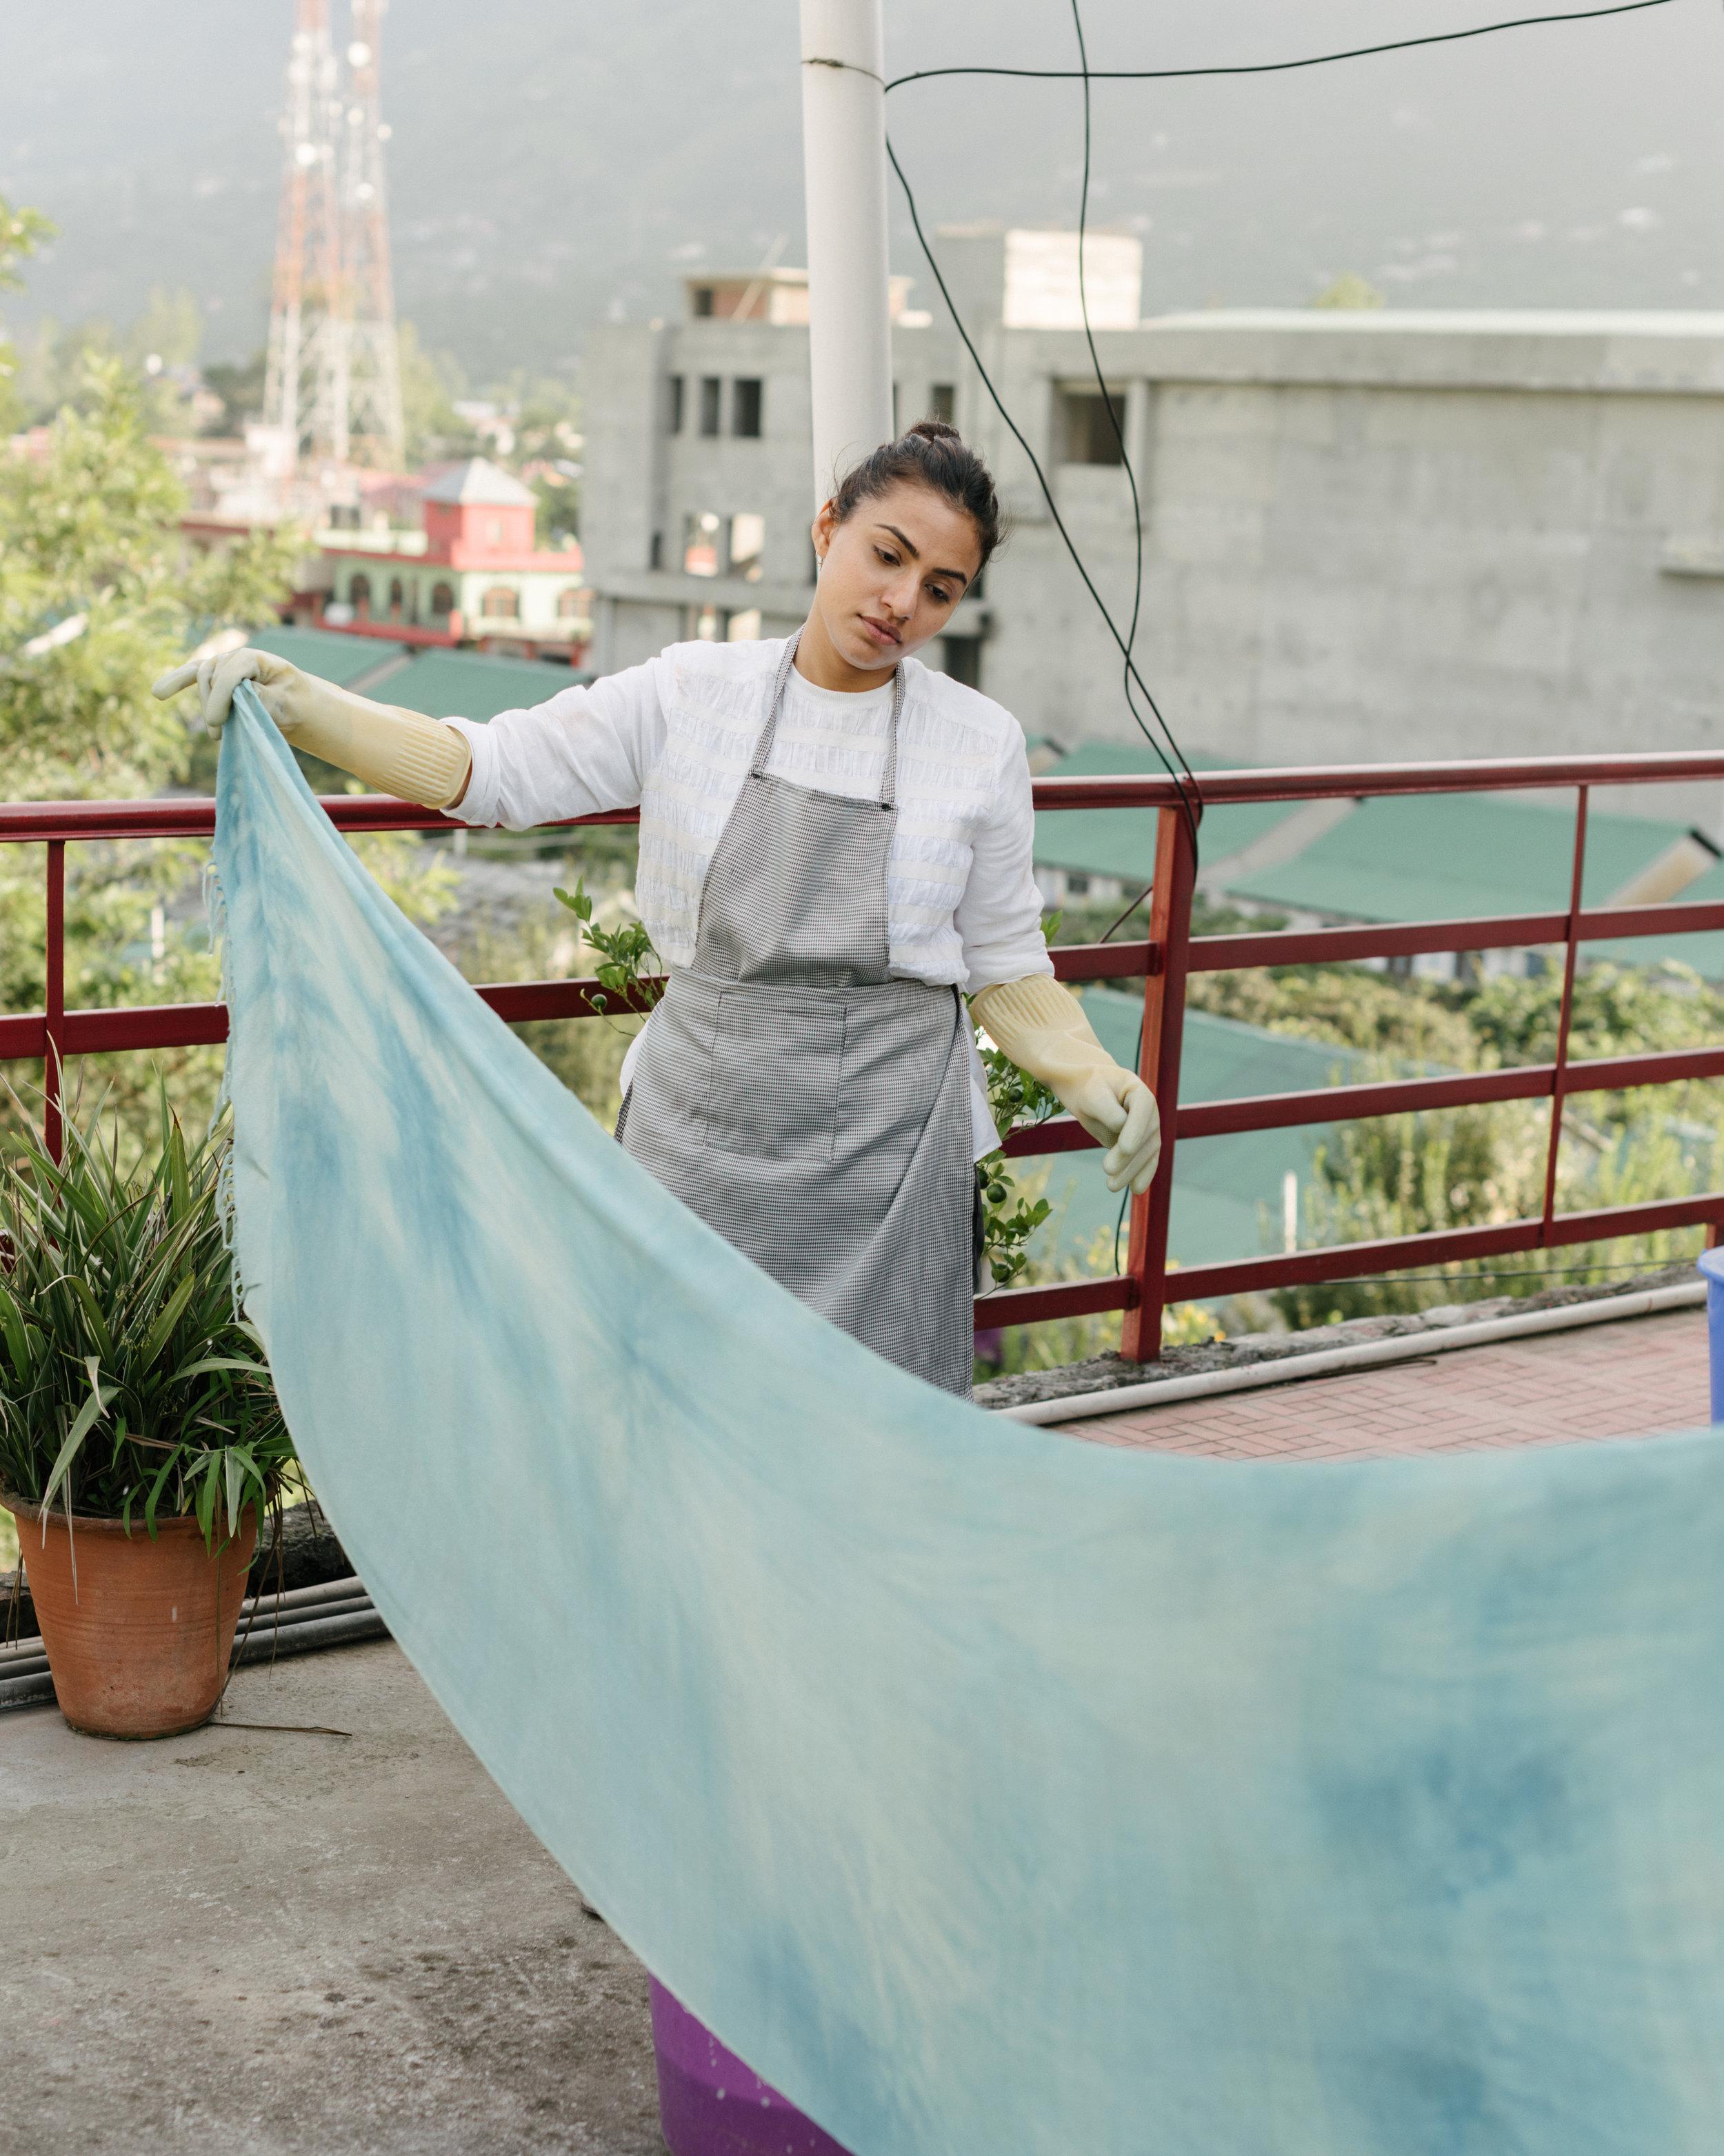 "<a href=""https://www.vogue.com/article/bodice-woolmark-prize-india-textiles-factory-tour"" target=""_Blank"">VOGUE</a>"